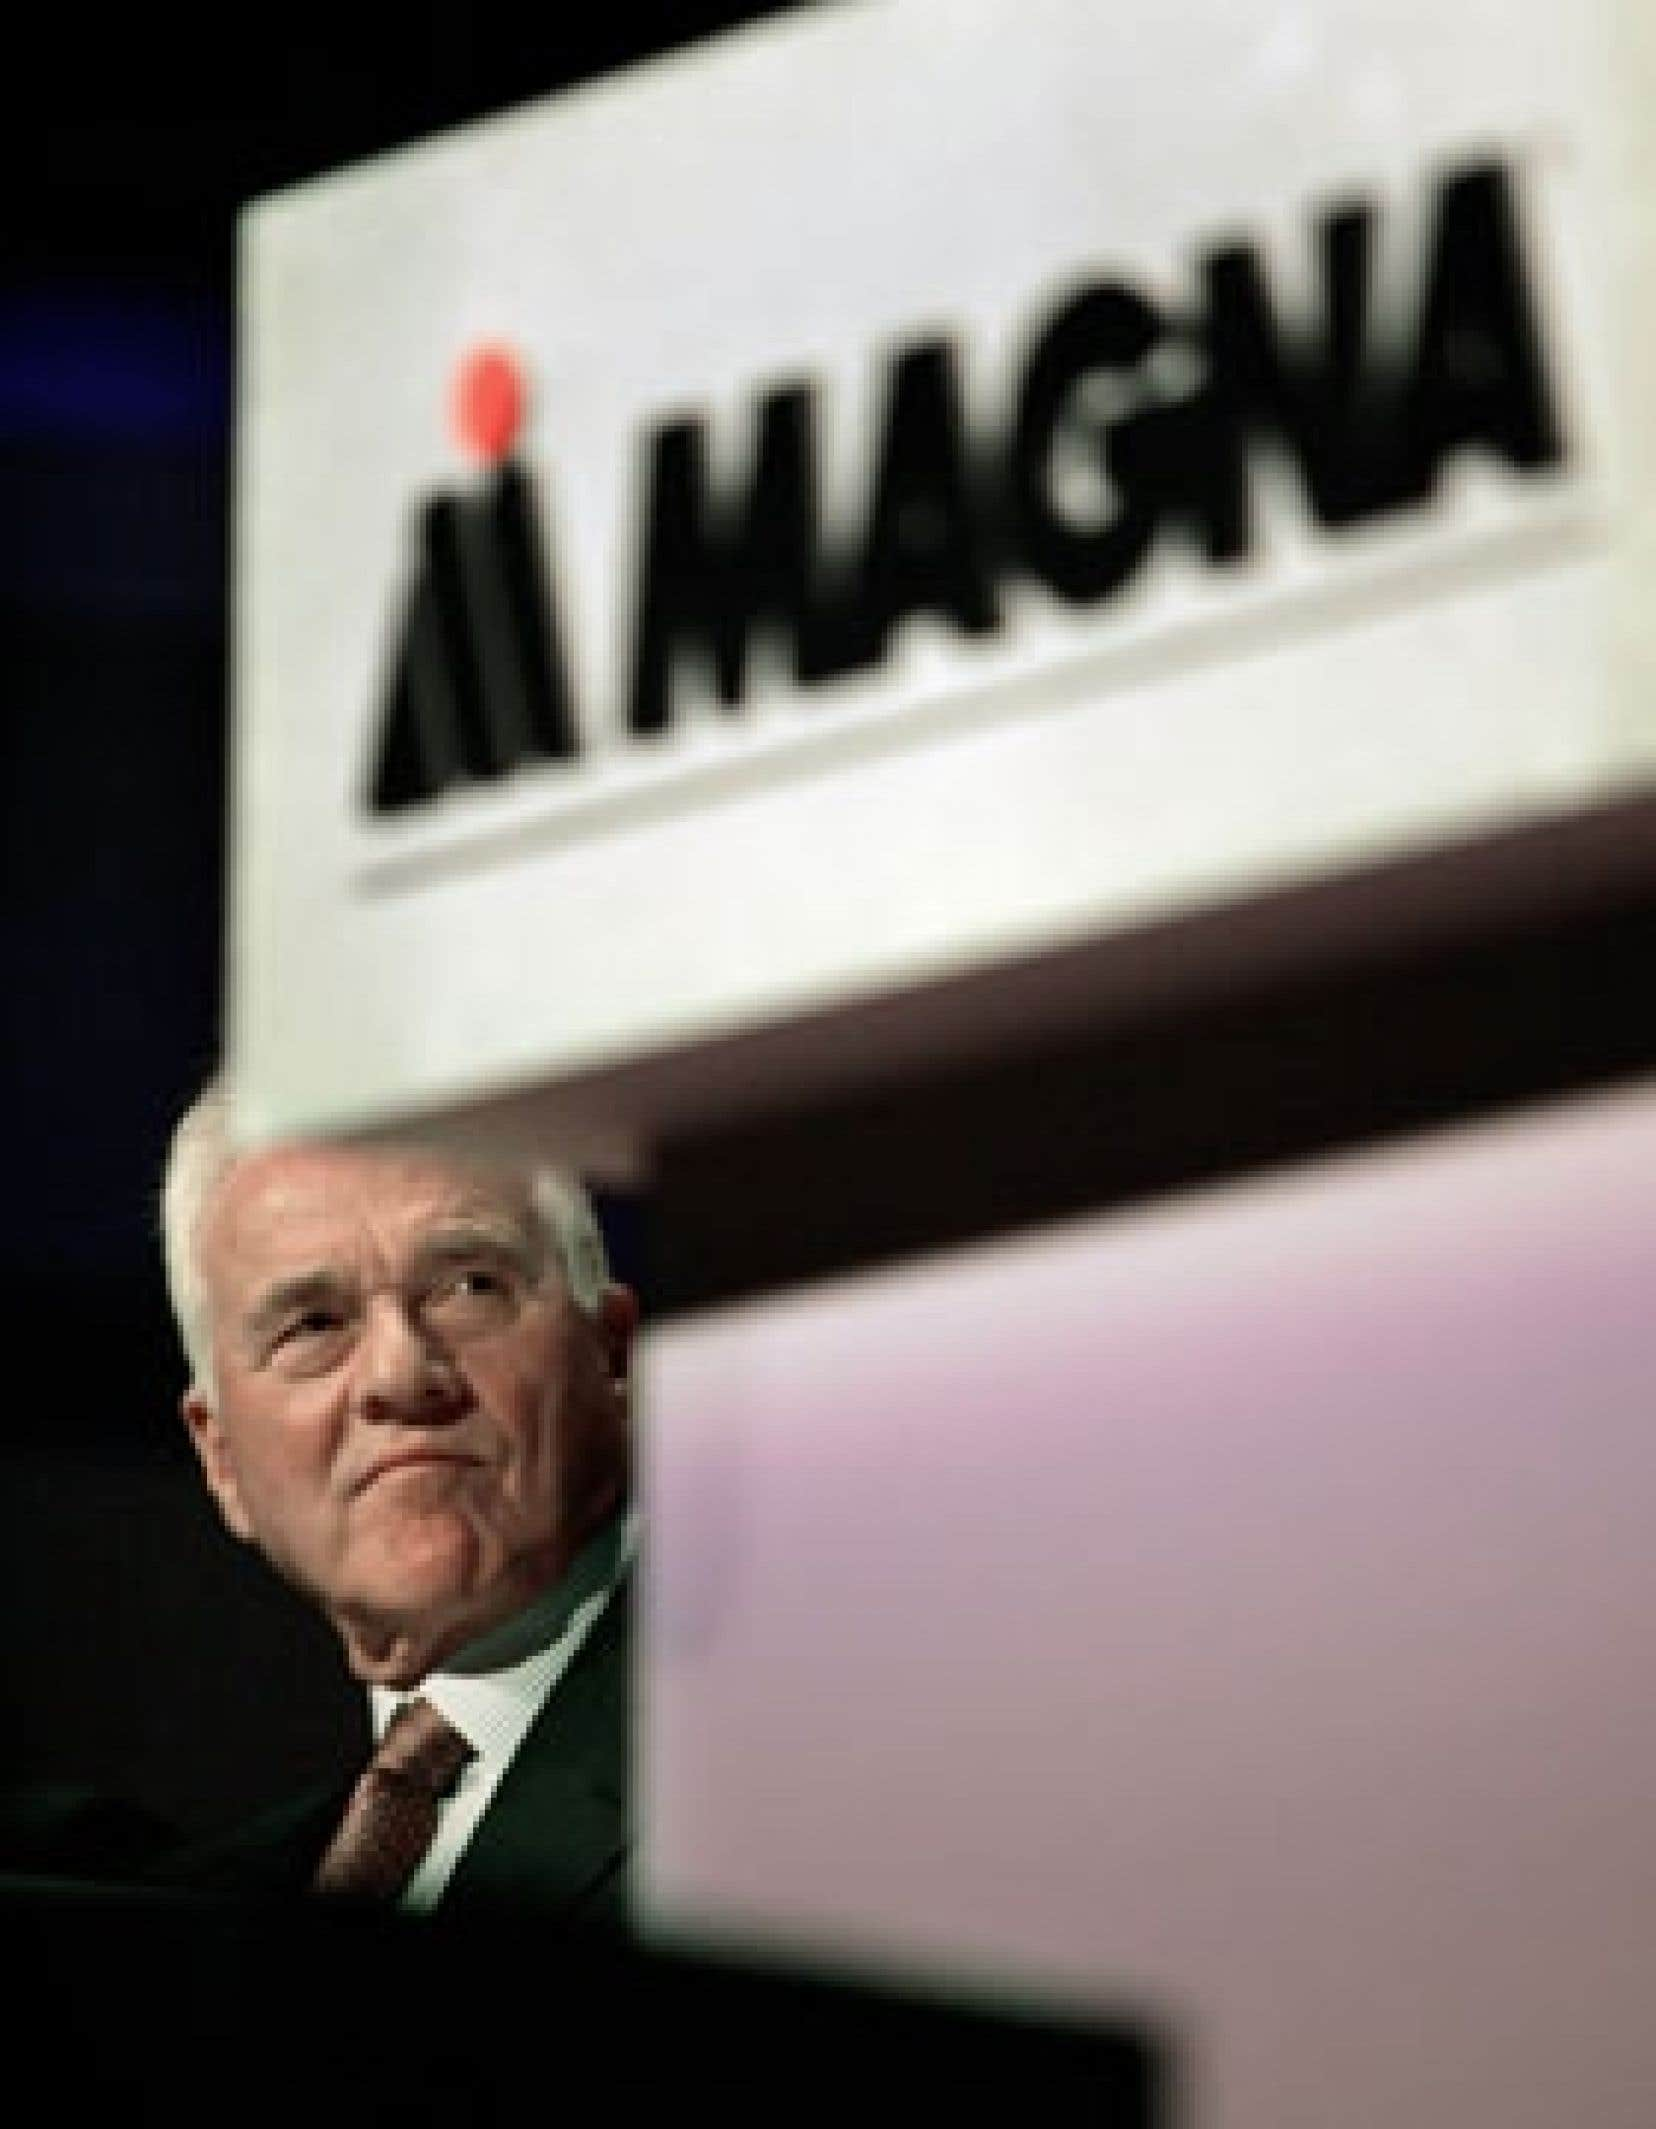 Frank Stronach, le président de Magna International